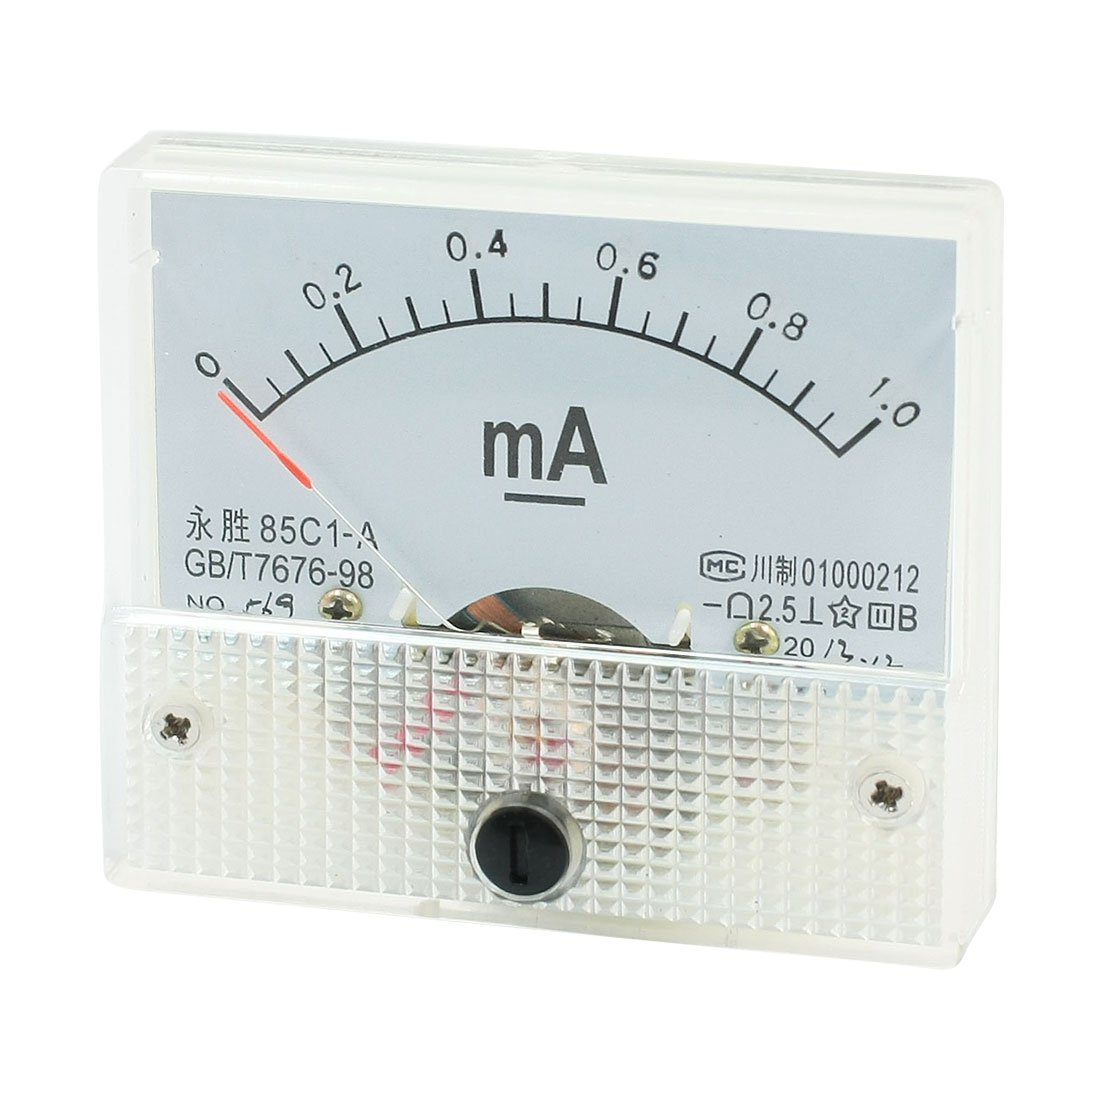 Sourcingmap - 64mm x 56mm rectangular dc 0-1ma amperí metro medidor de panel analó gico-85c1 una US-SA-AJD-47846